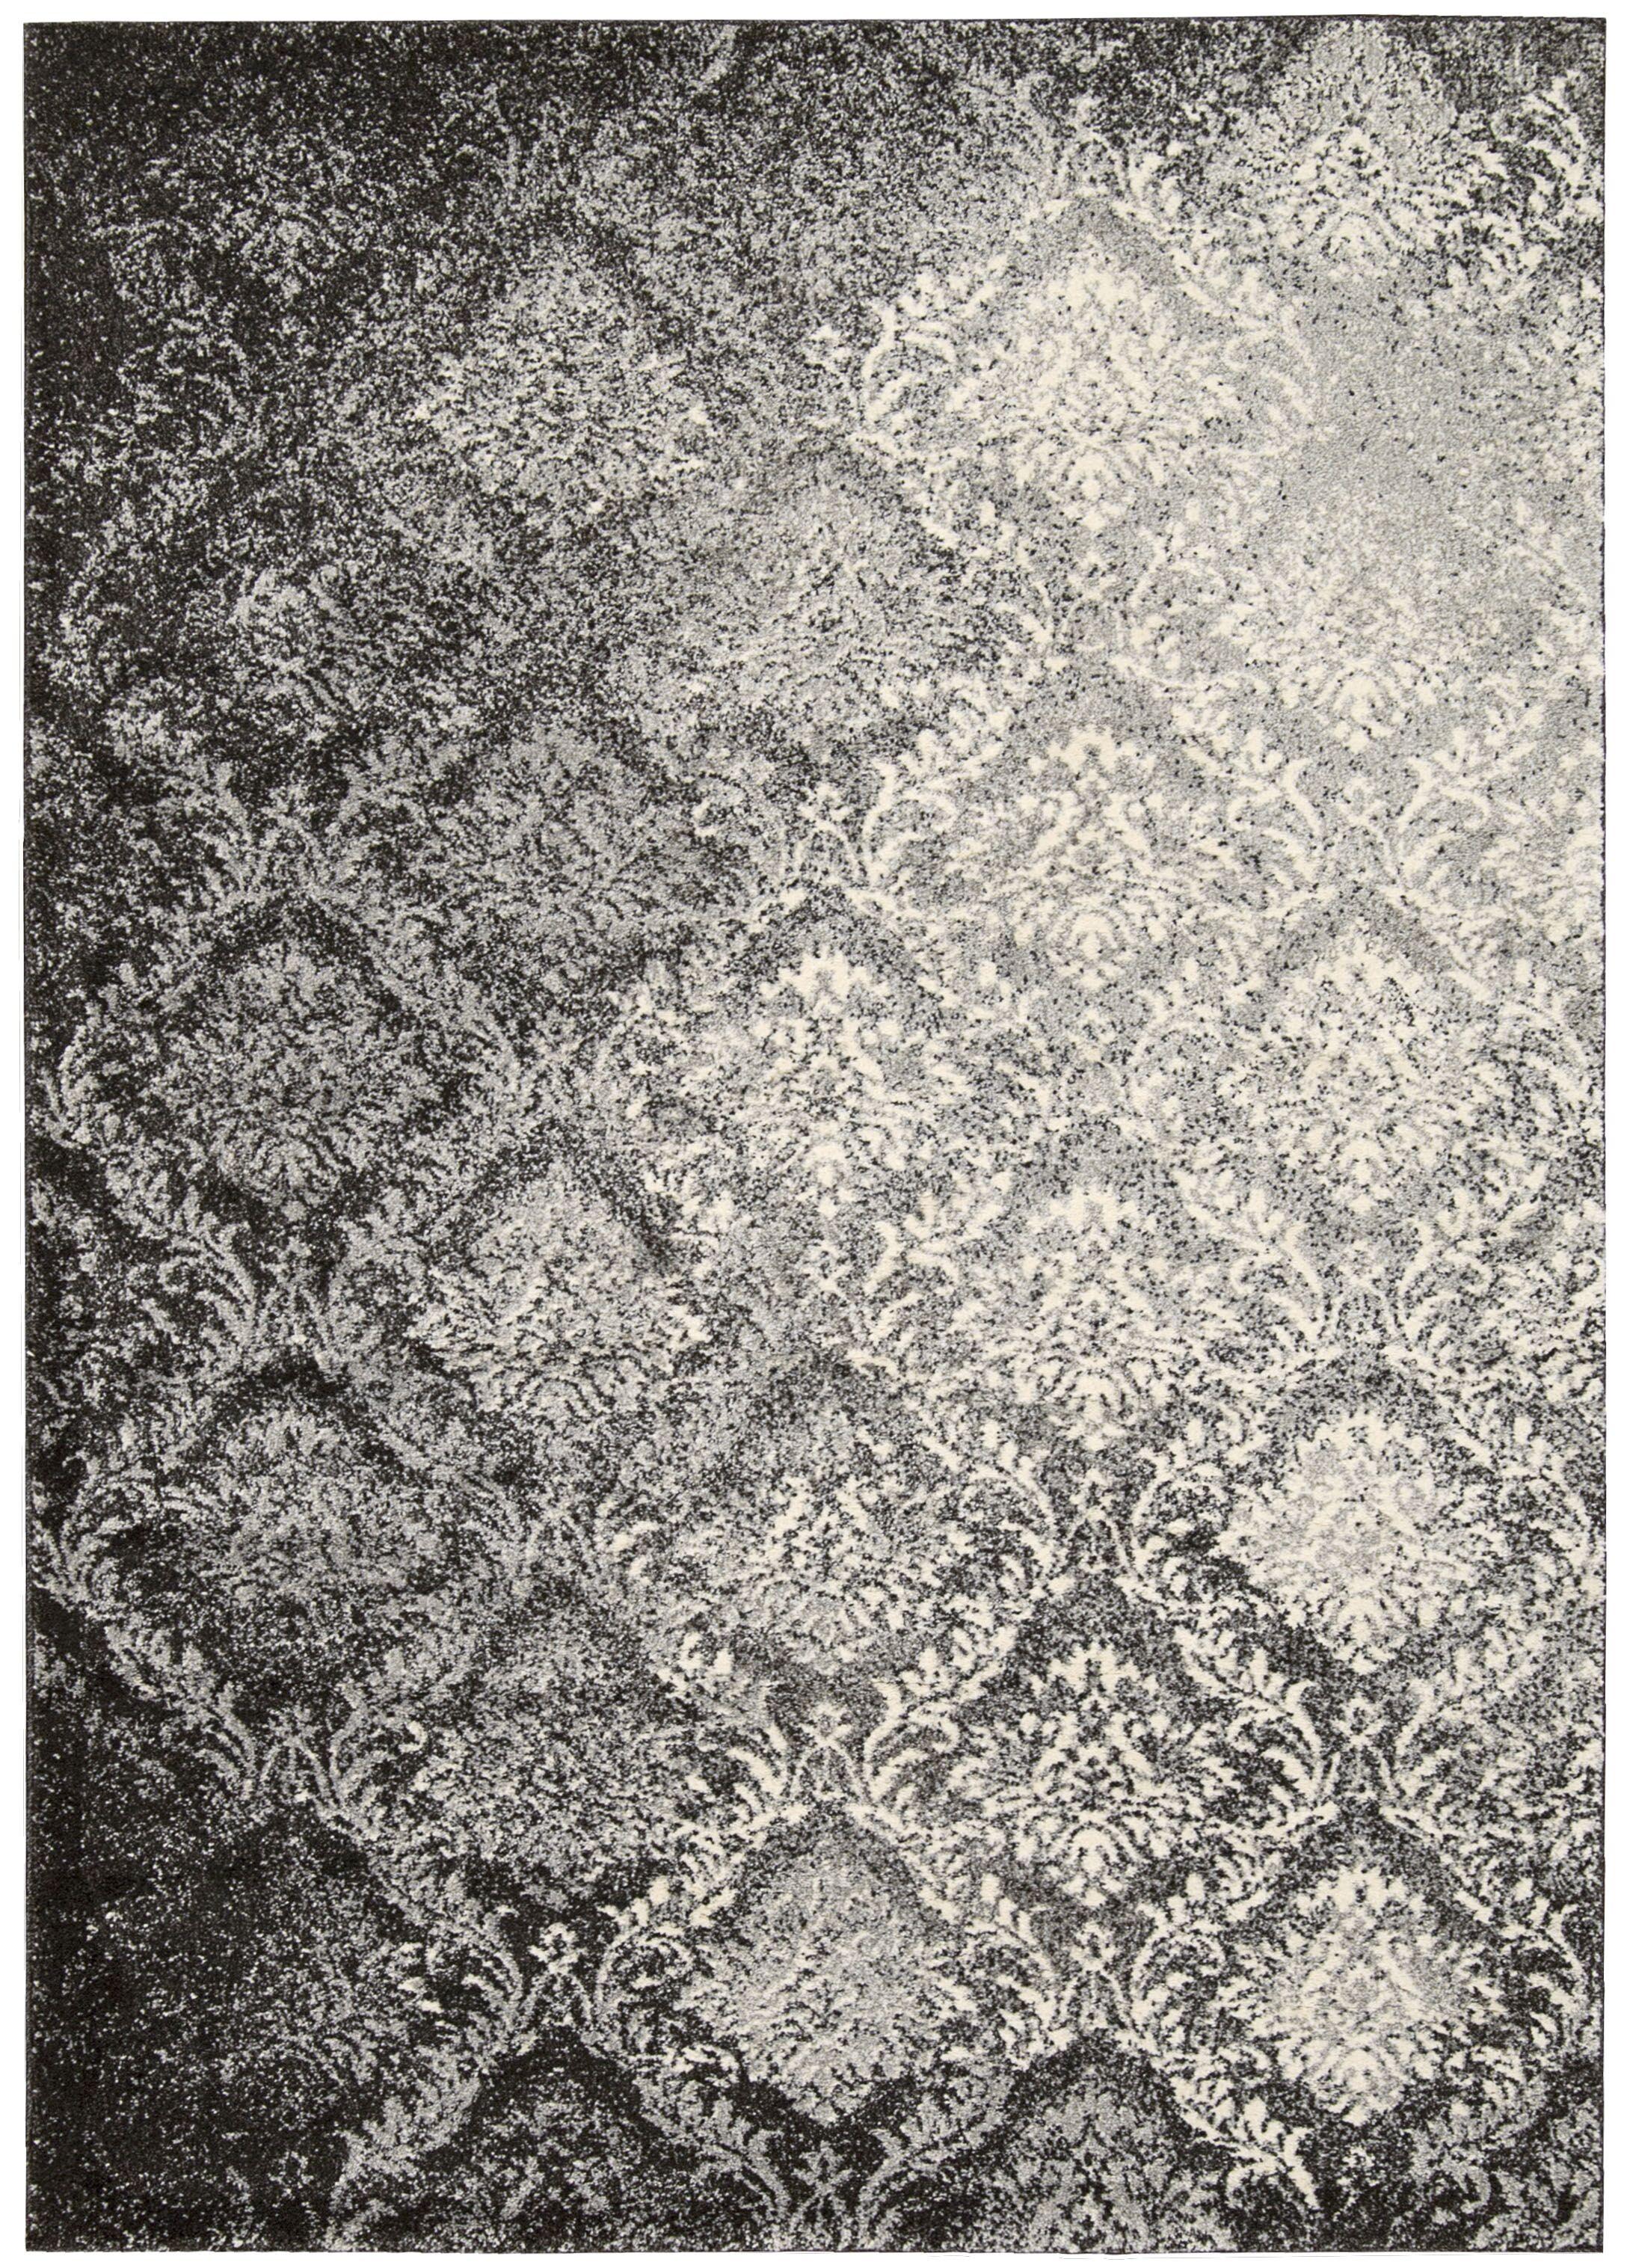 Santa Barbara Royal Shimmer Gray Area Rug Rug Size: Rectangle 3'9